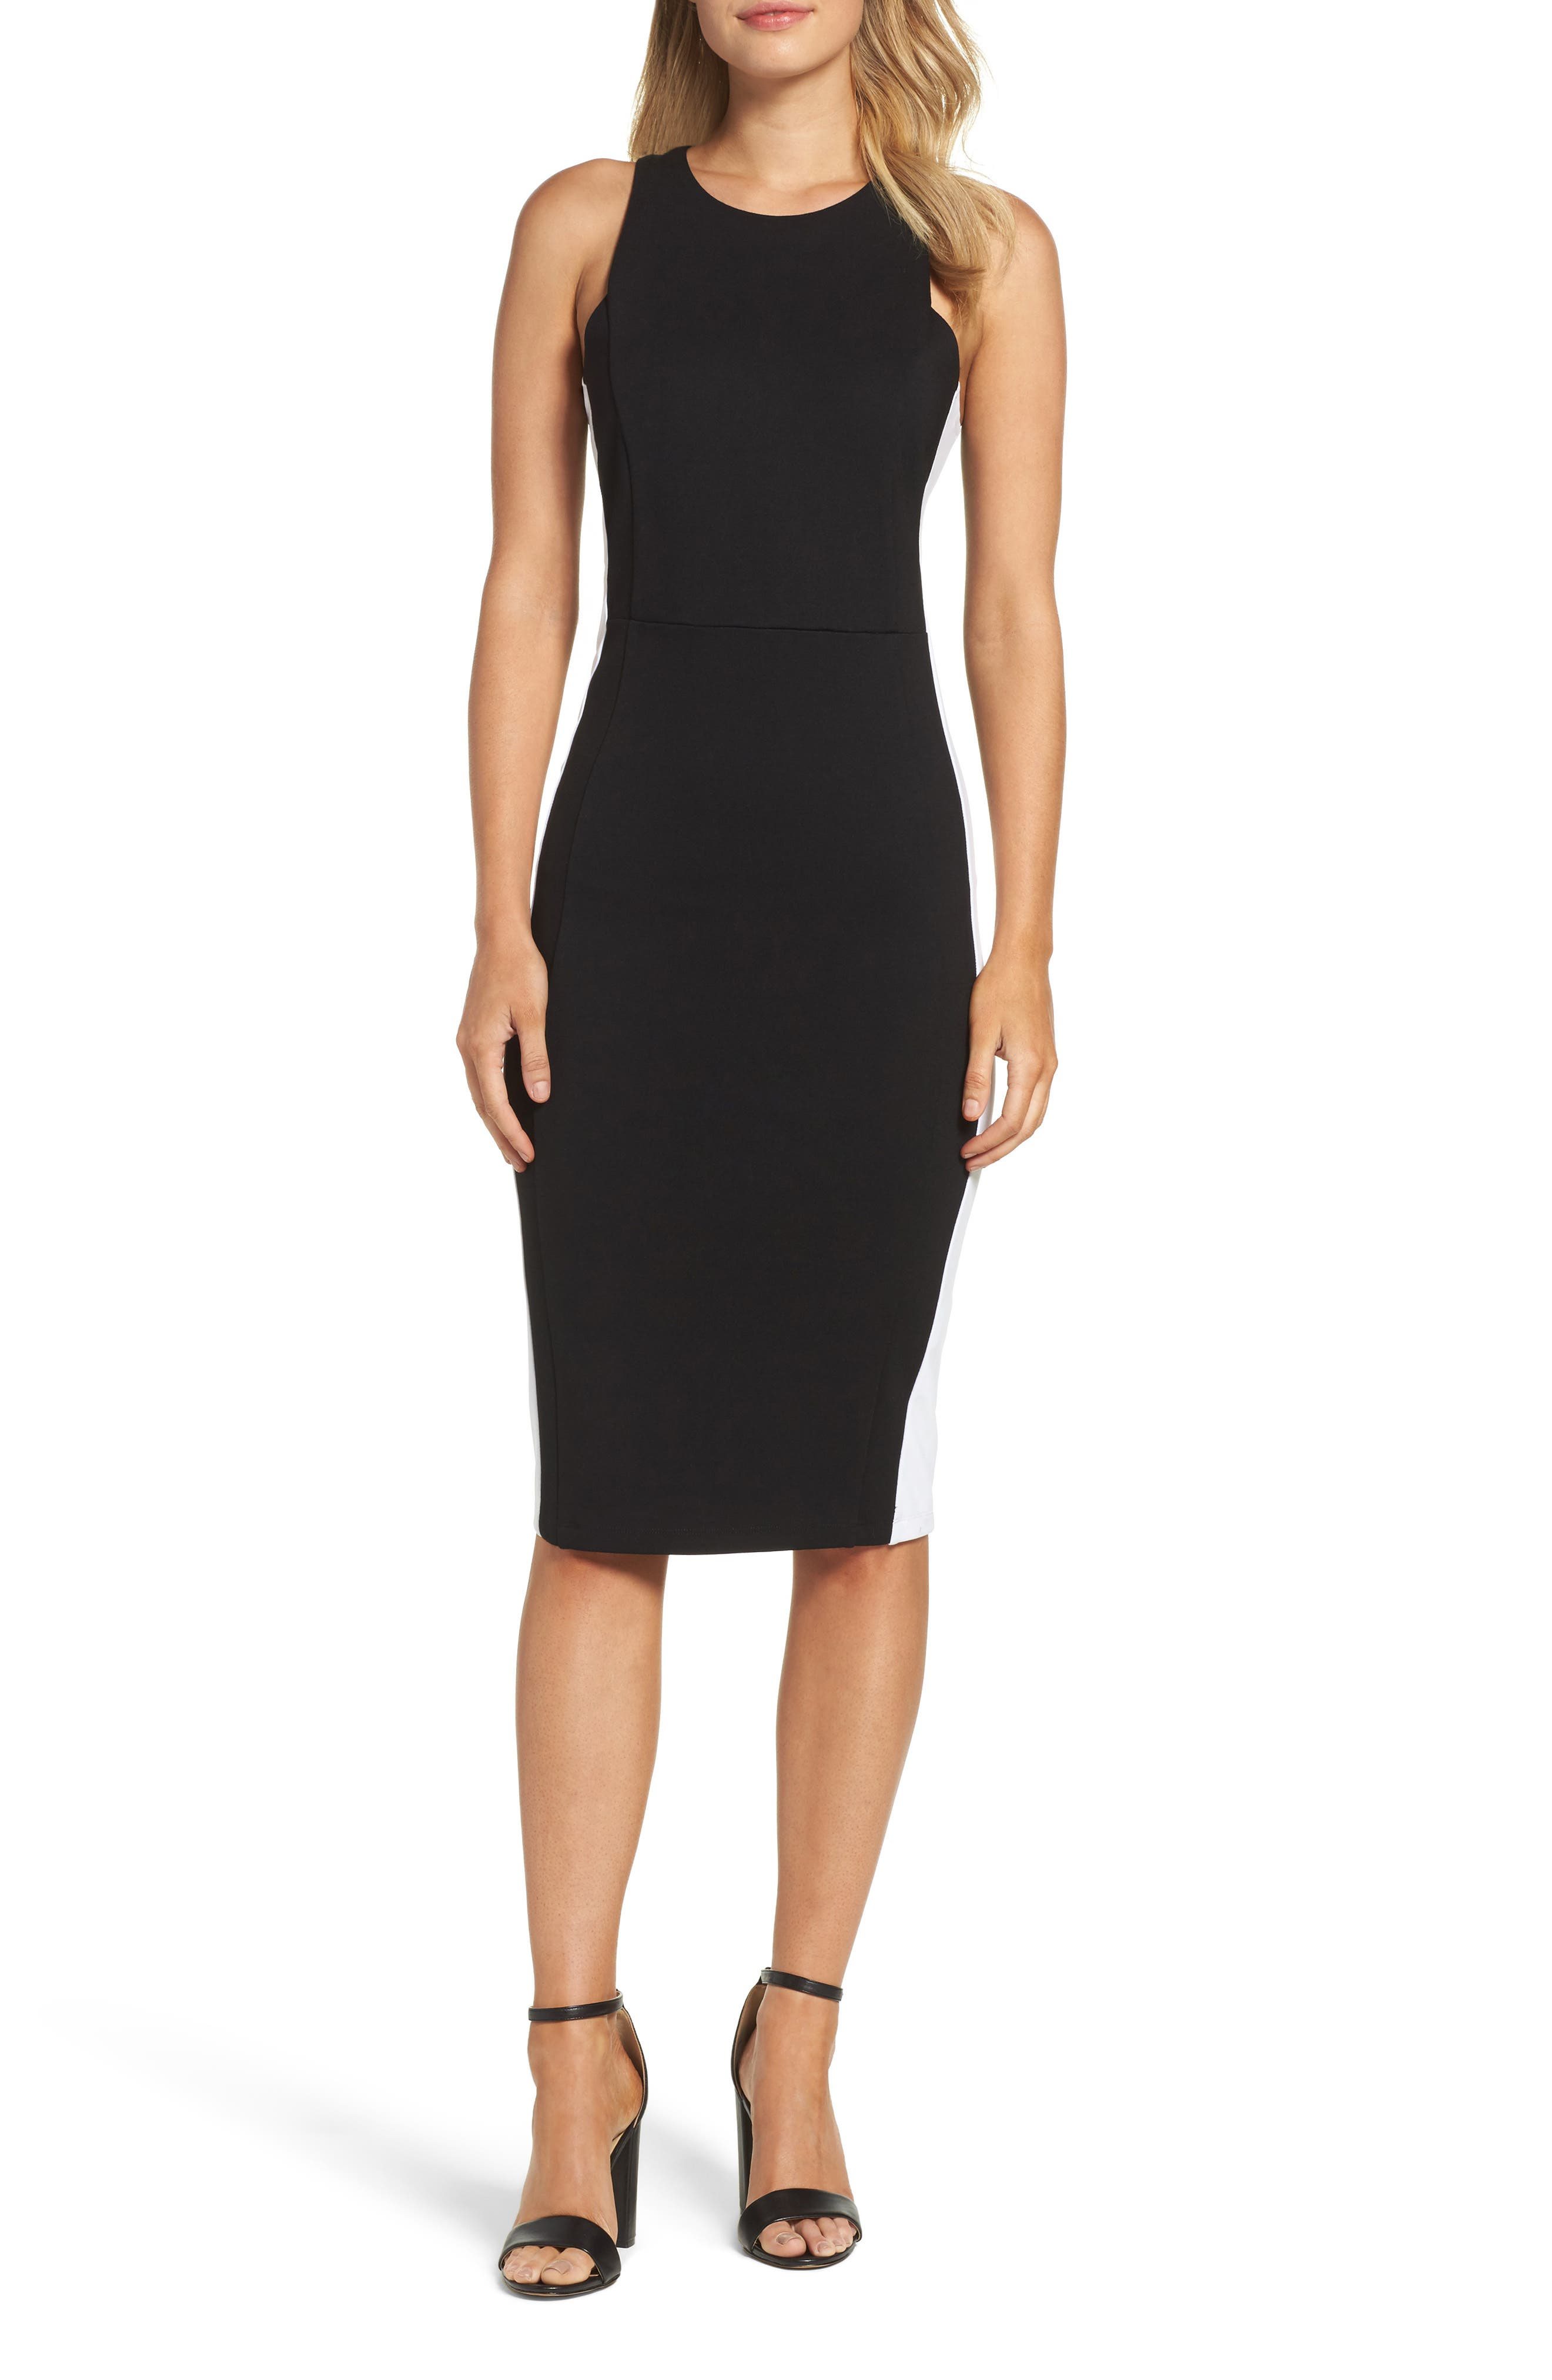 Orlanda Ponte Knit Sheath Dress,                         Main,                         color, Black/ White